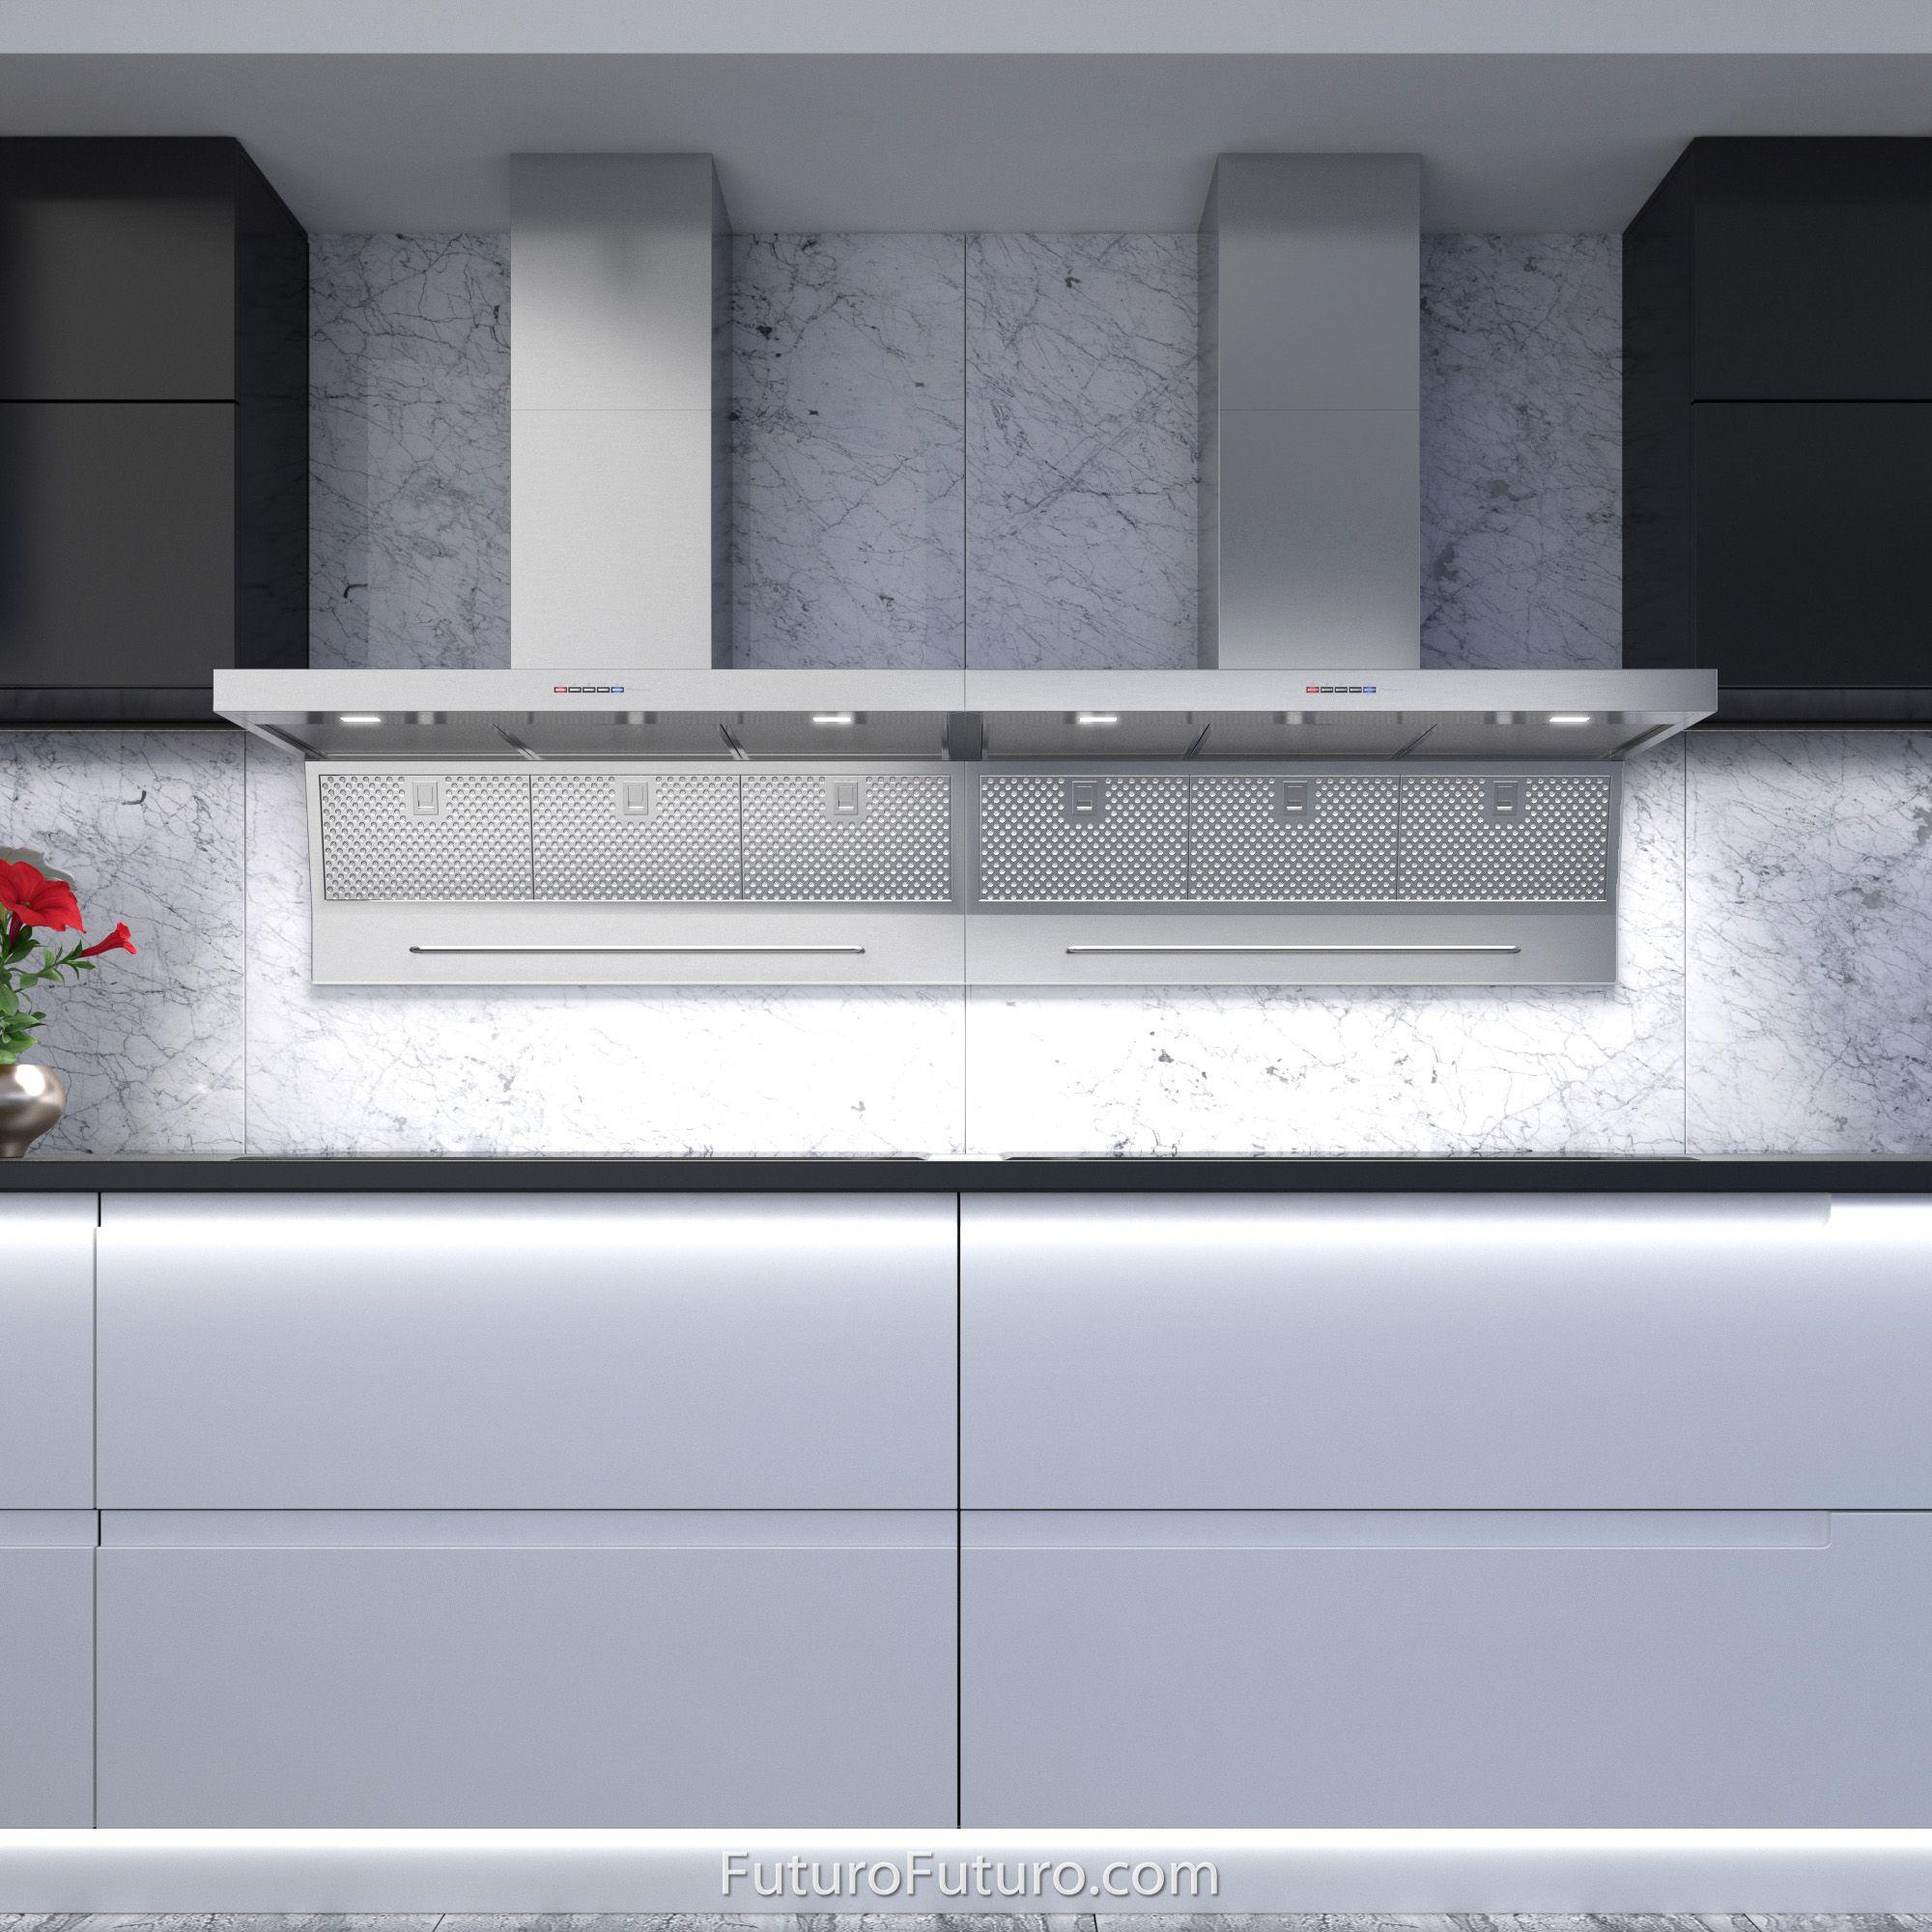 36 Magnus Wall Mount Range Hood By Futuro Futuro In 2020 Wall Mount Range Hood Kitchen Ventilation Kitchen Fan